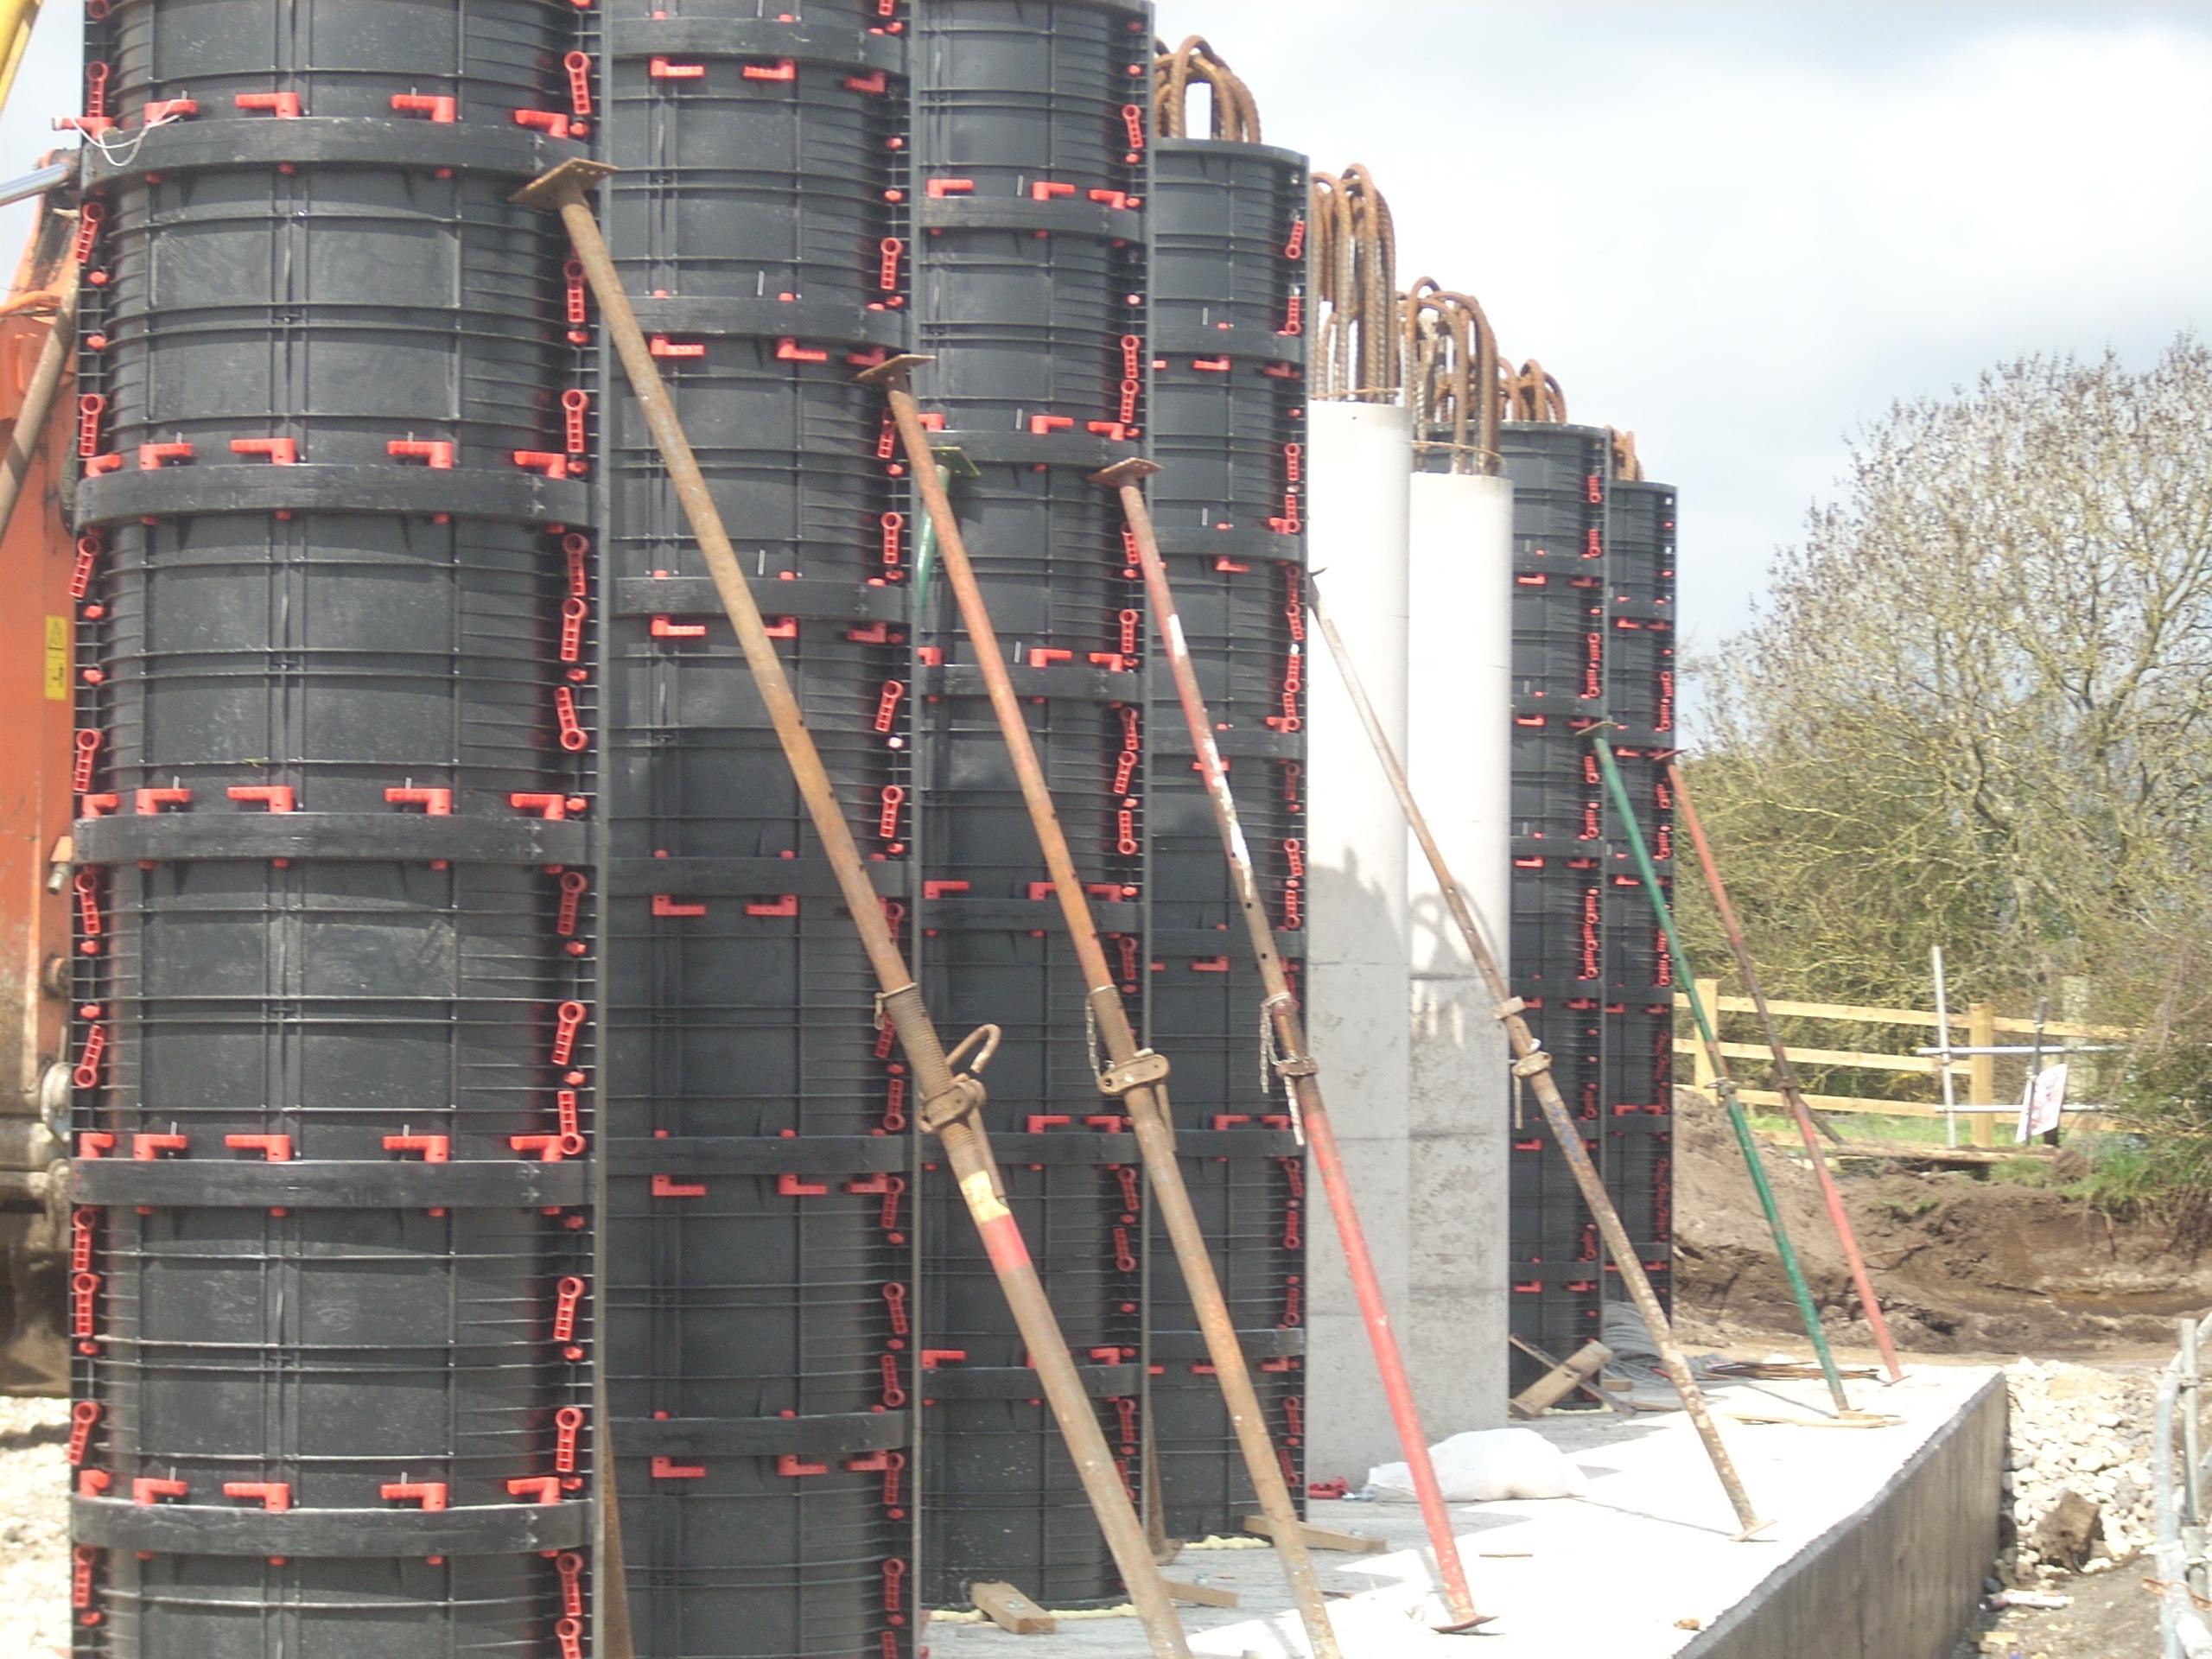 Cofraje refolosibile pentru coloane cilindrice GEOPLAST - Poza 1